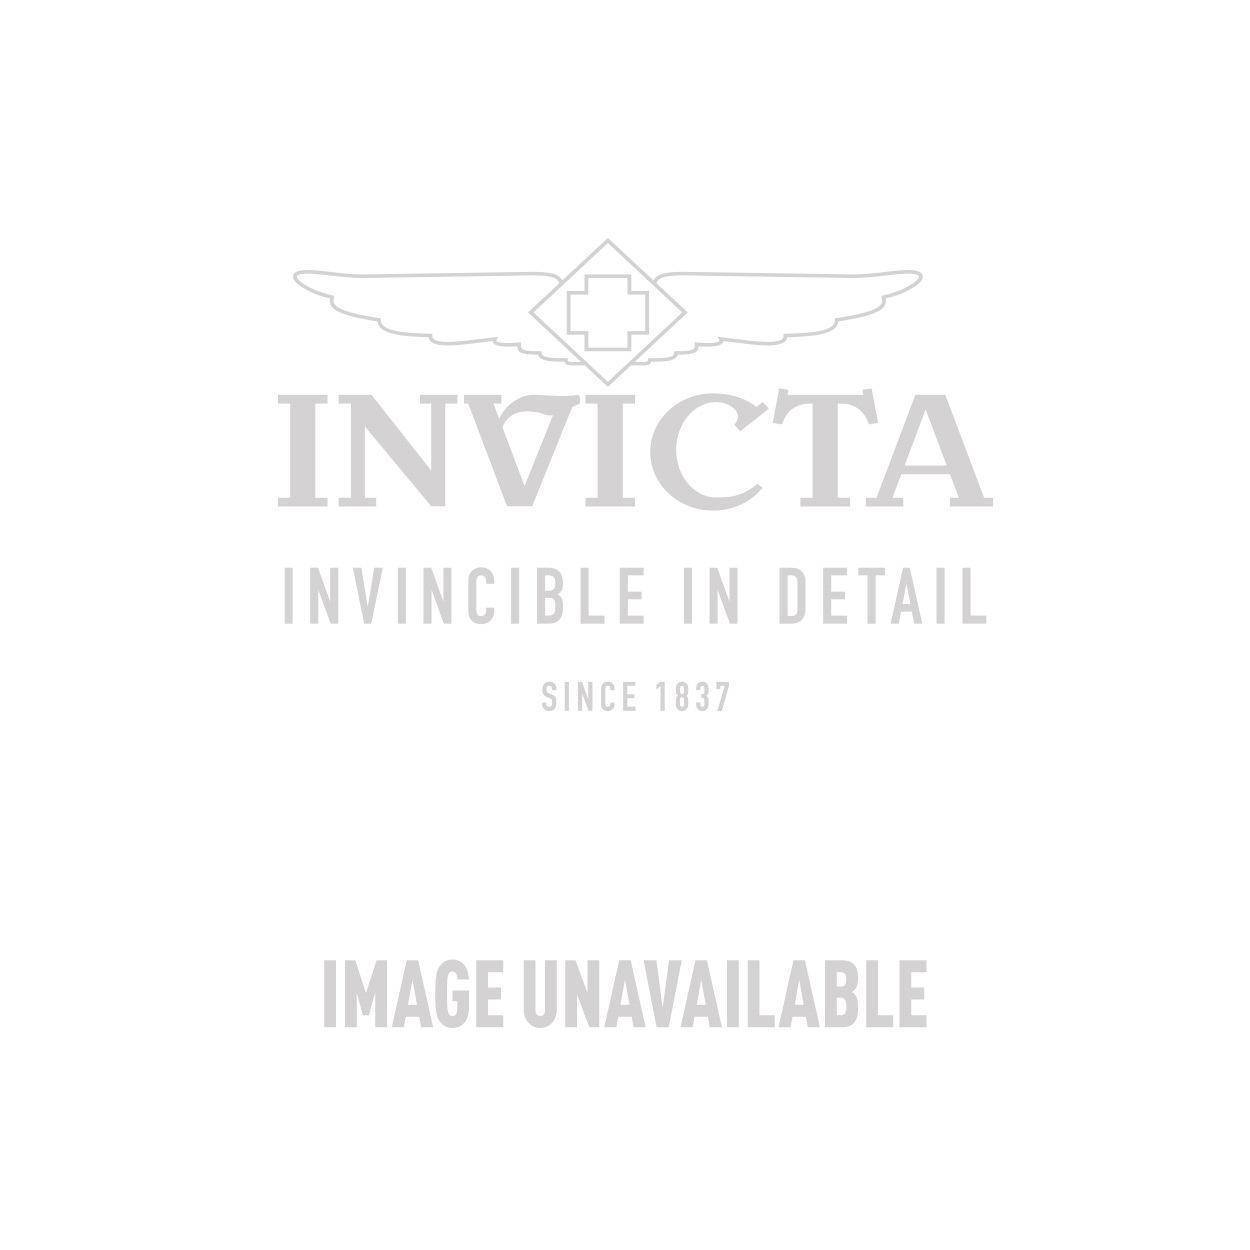 Invicta S1 Rally Mens Quartz 48 mm Gunmetal Case Gunmetal, Silver Dial - Model 27924